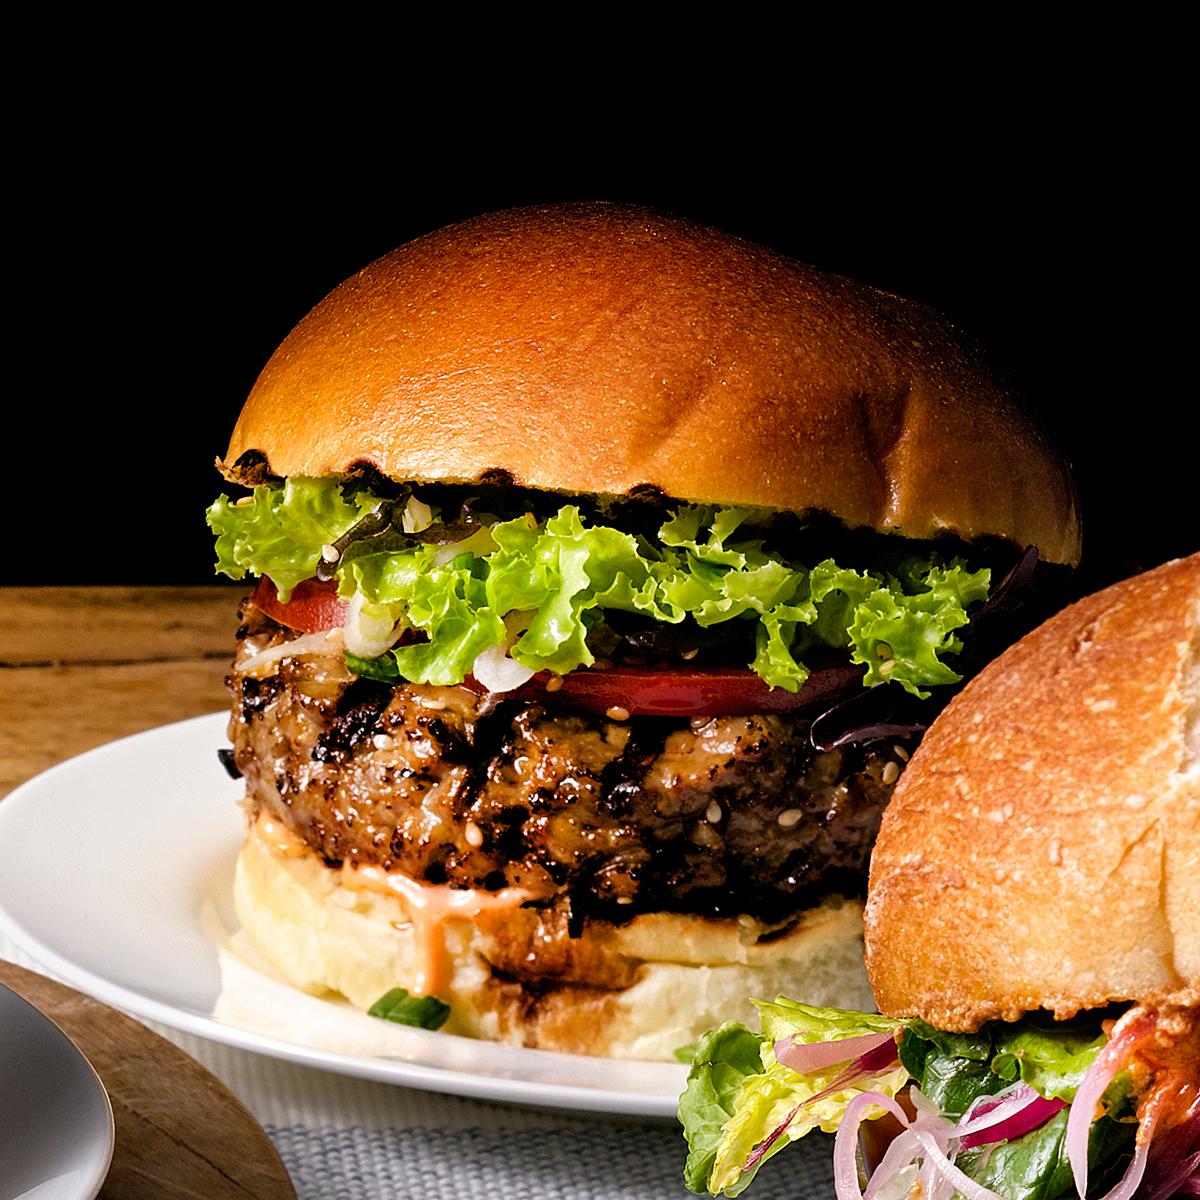 spicy tuna burger on plate